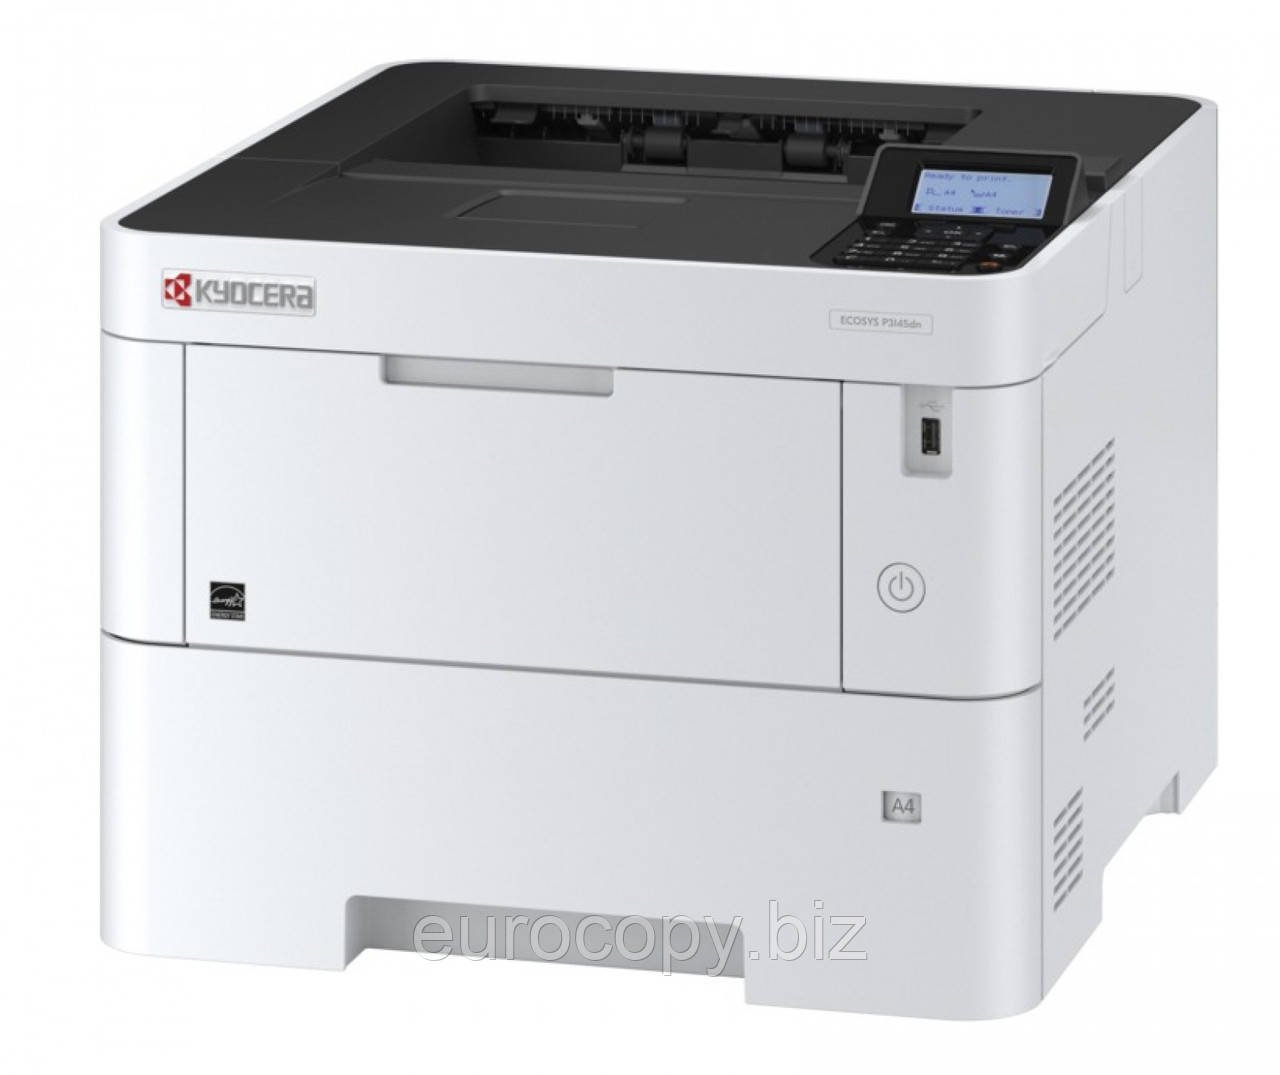 Принтер Kyocera А4 моно ECOSYS P3145dn (1102TT3NL0)